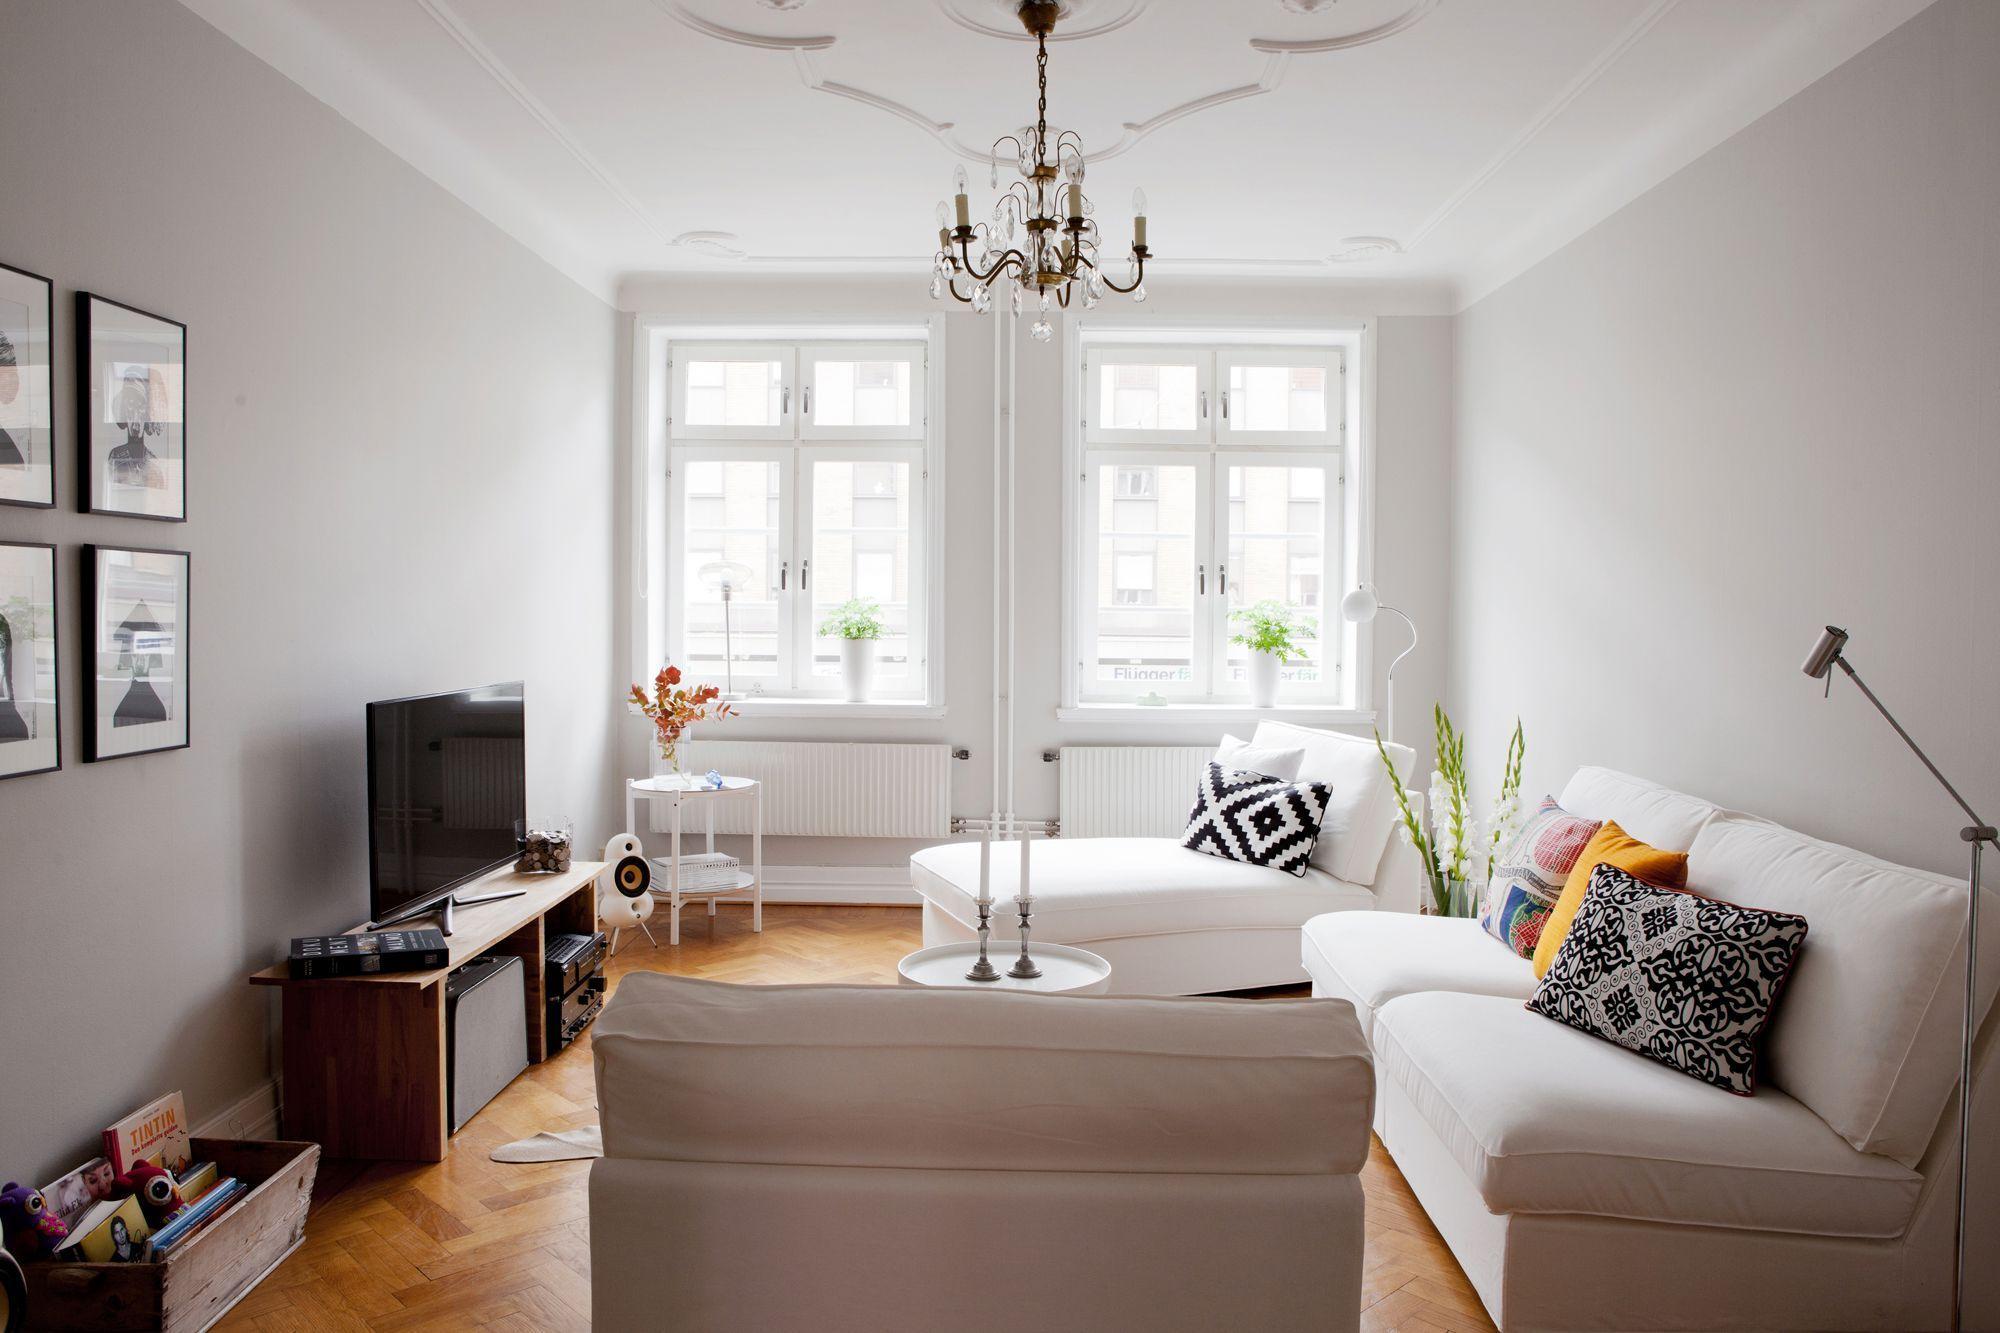 Paredes grises muebles blancos suelo de madera color - Muebles grises paredes color ...